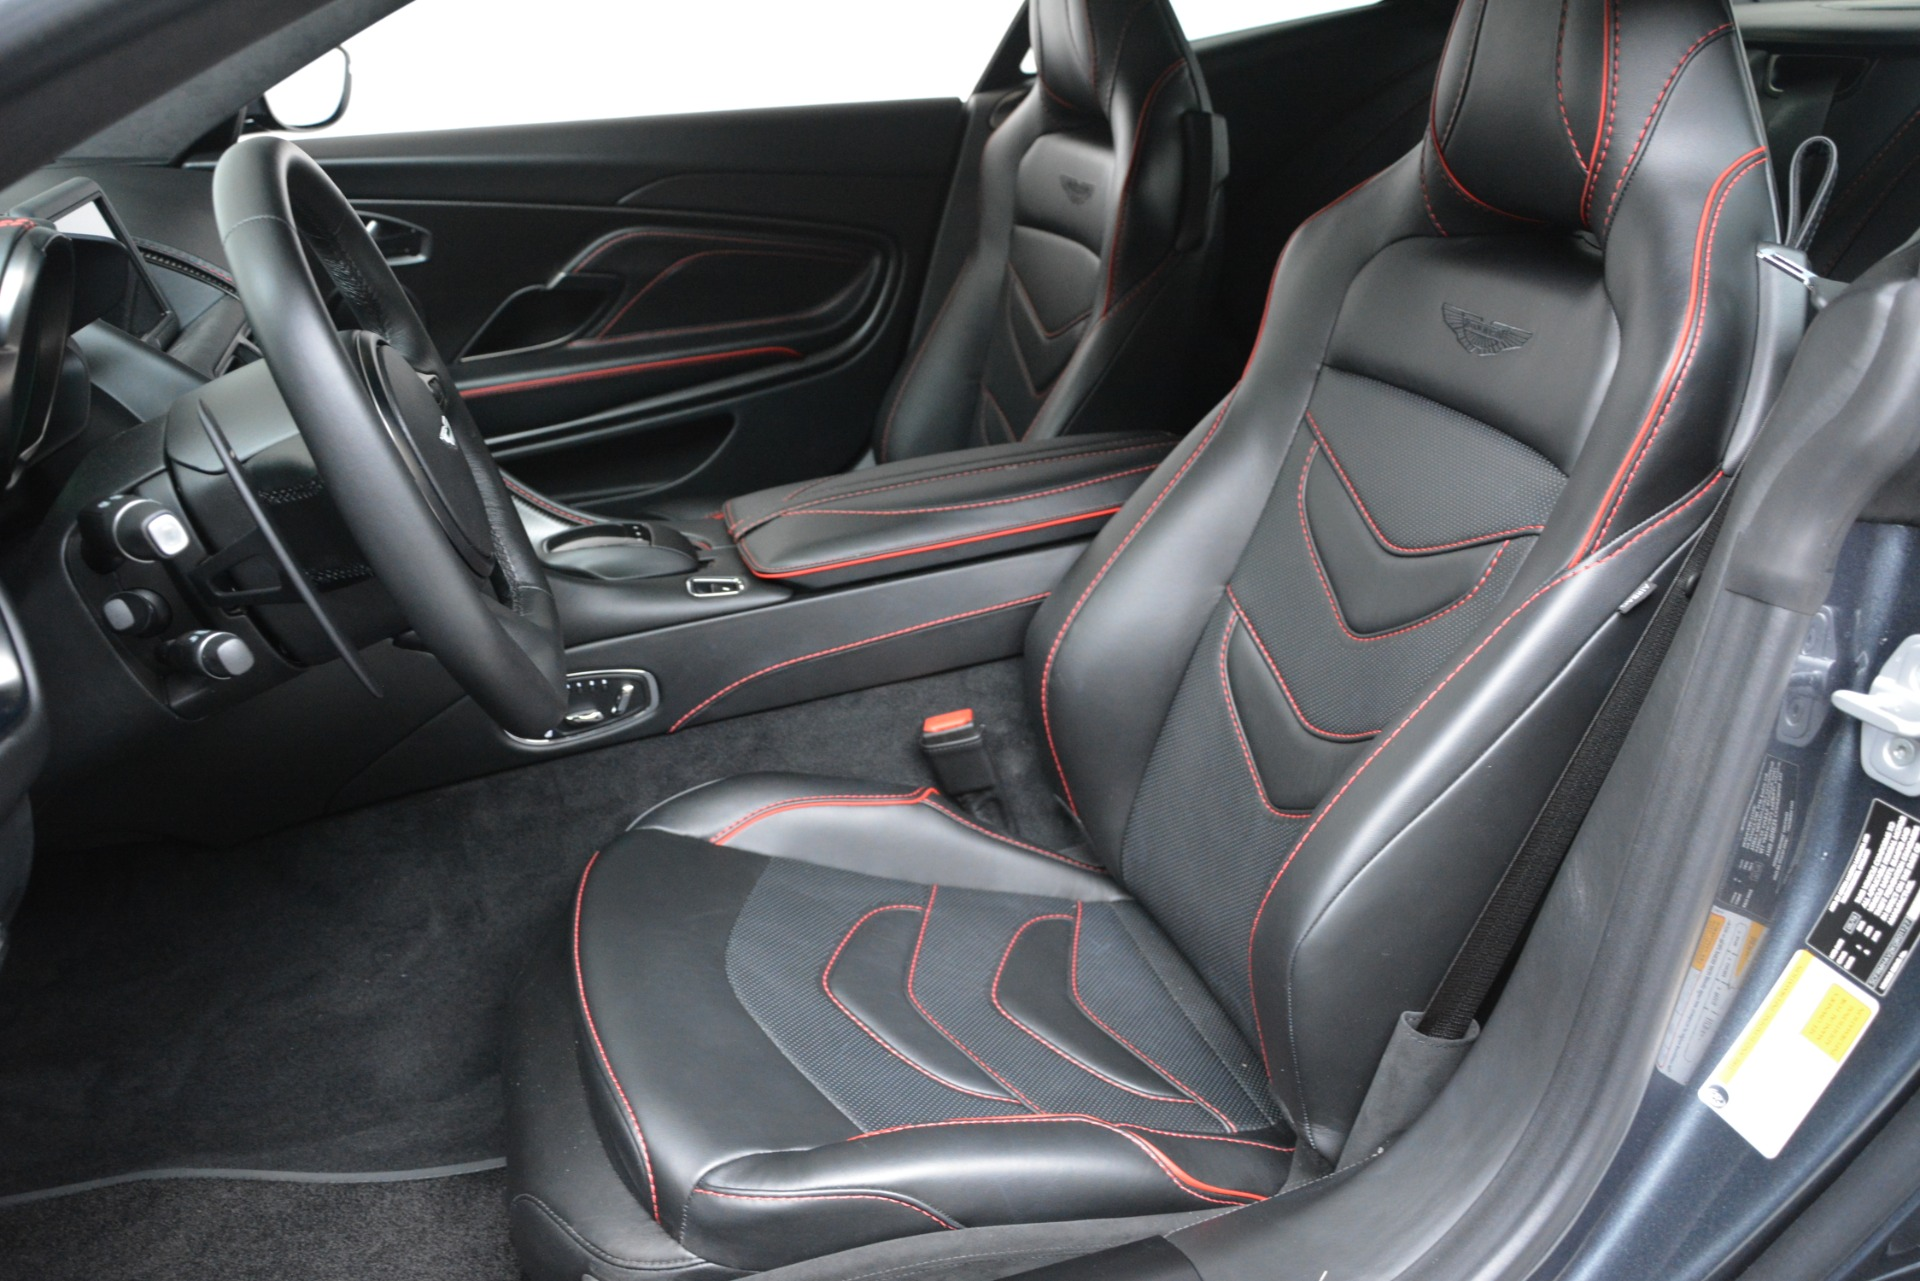 New 2019 Aston Martin DBS Superleggera For Sale In Westport, CT 3318_p13